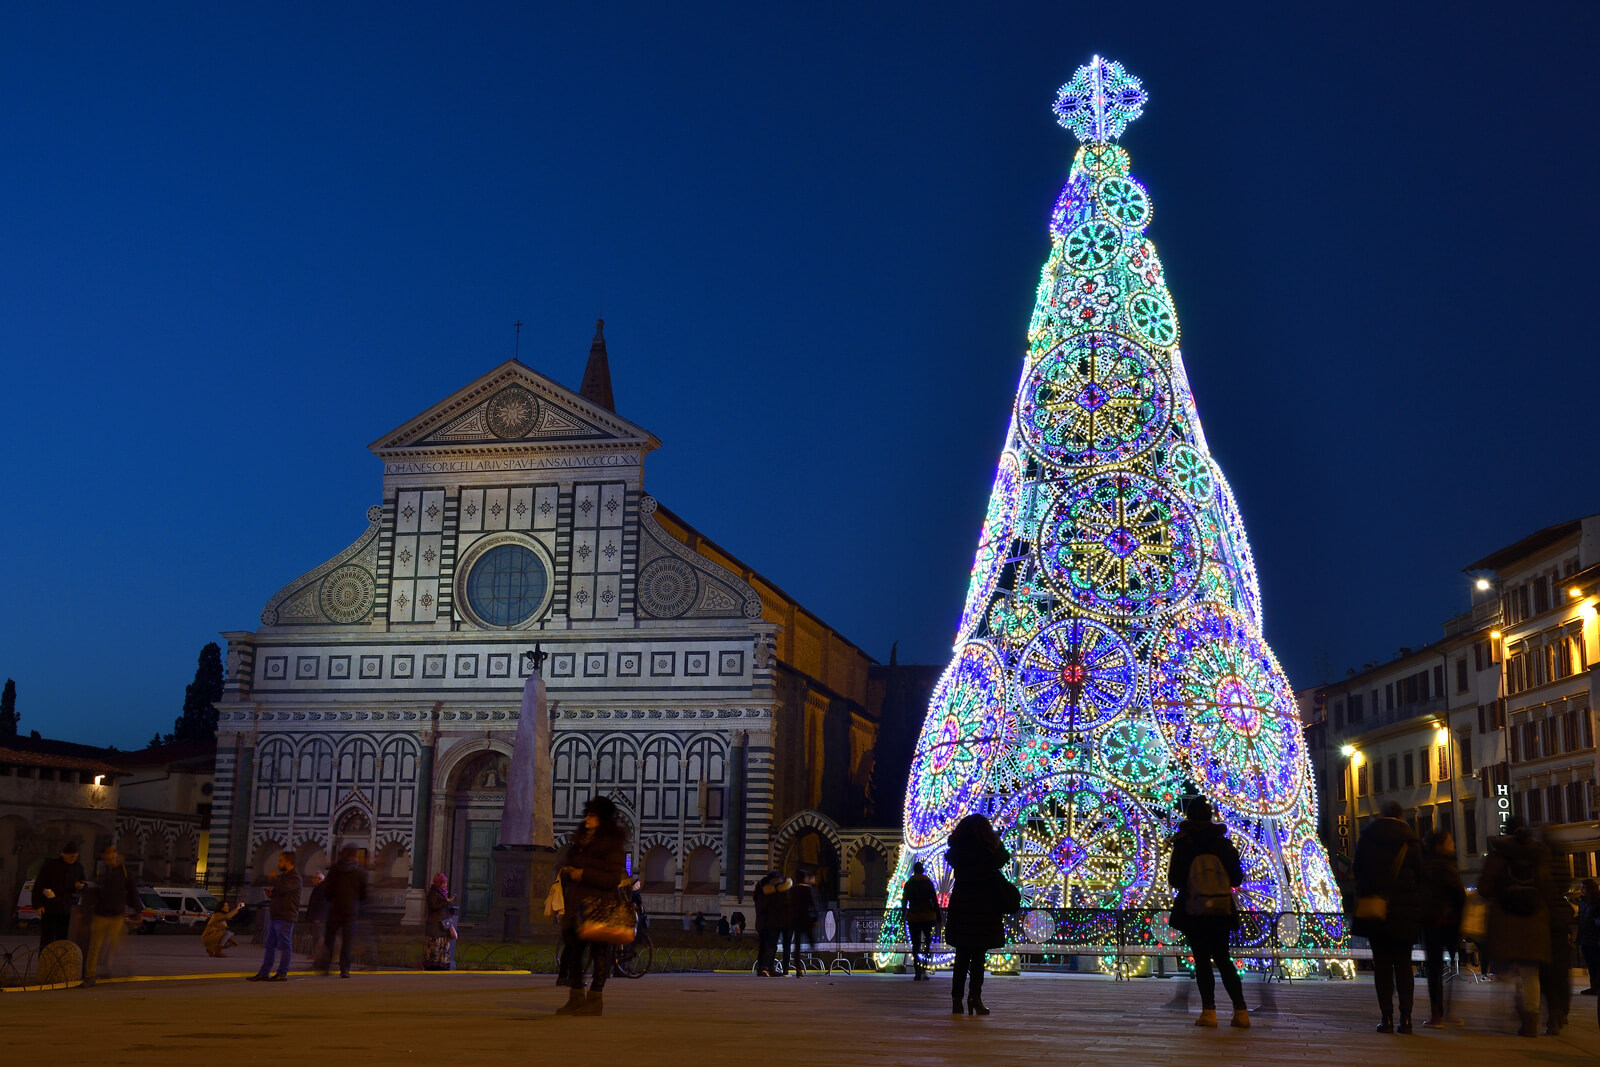 2021/01/Advent-Toskana-5.jpg